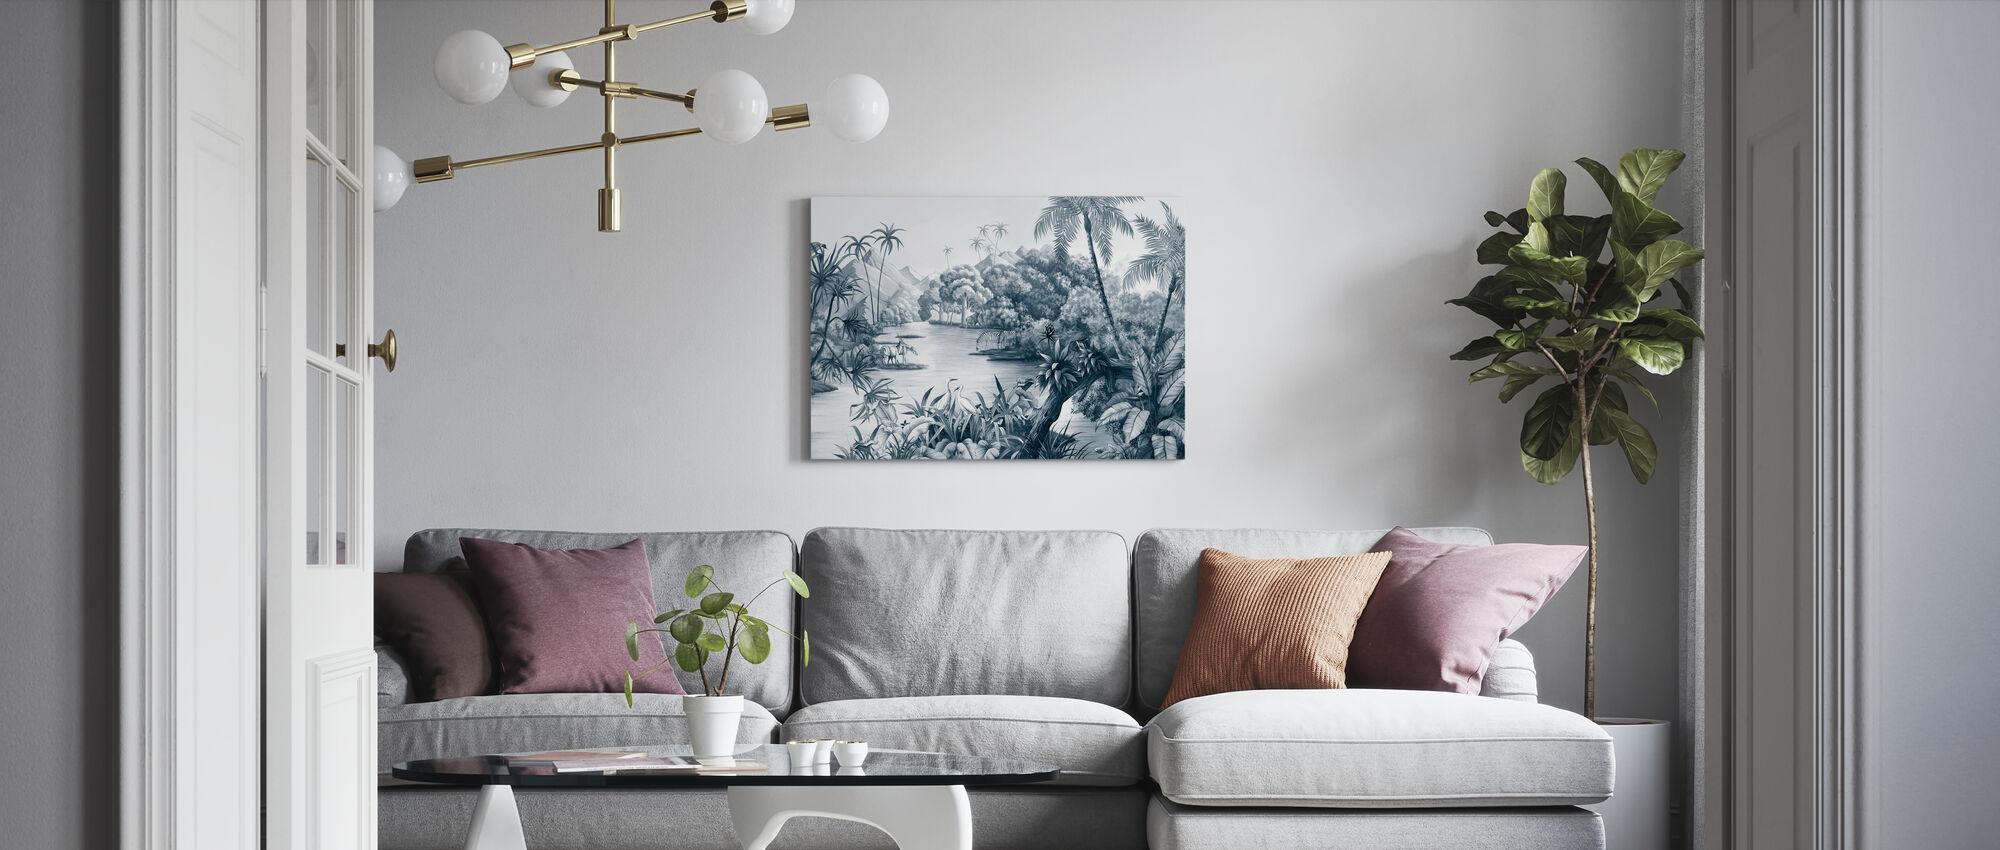 Tangled Jungle II - Blue - Canvas print - Living Room